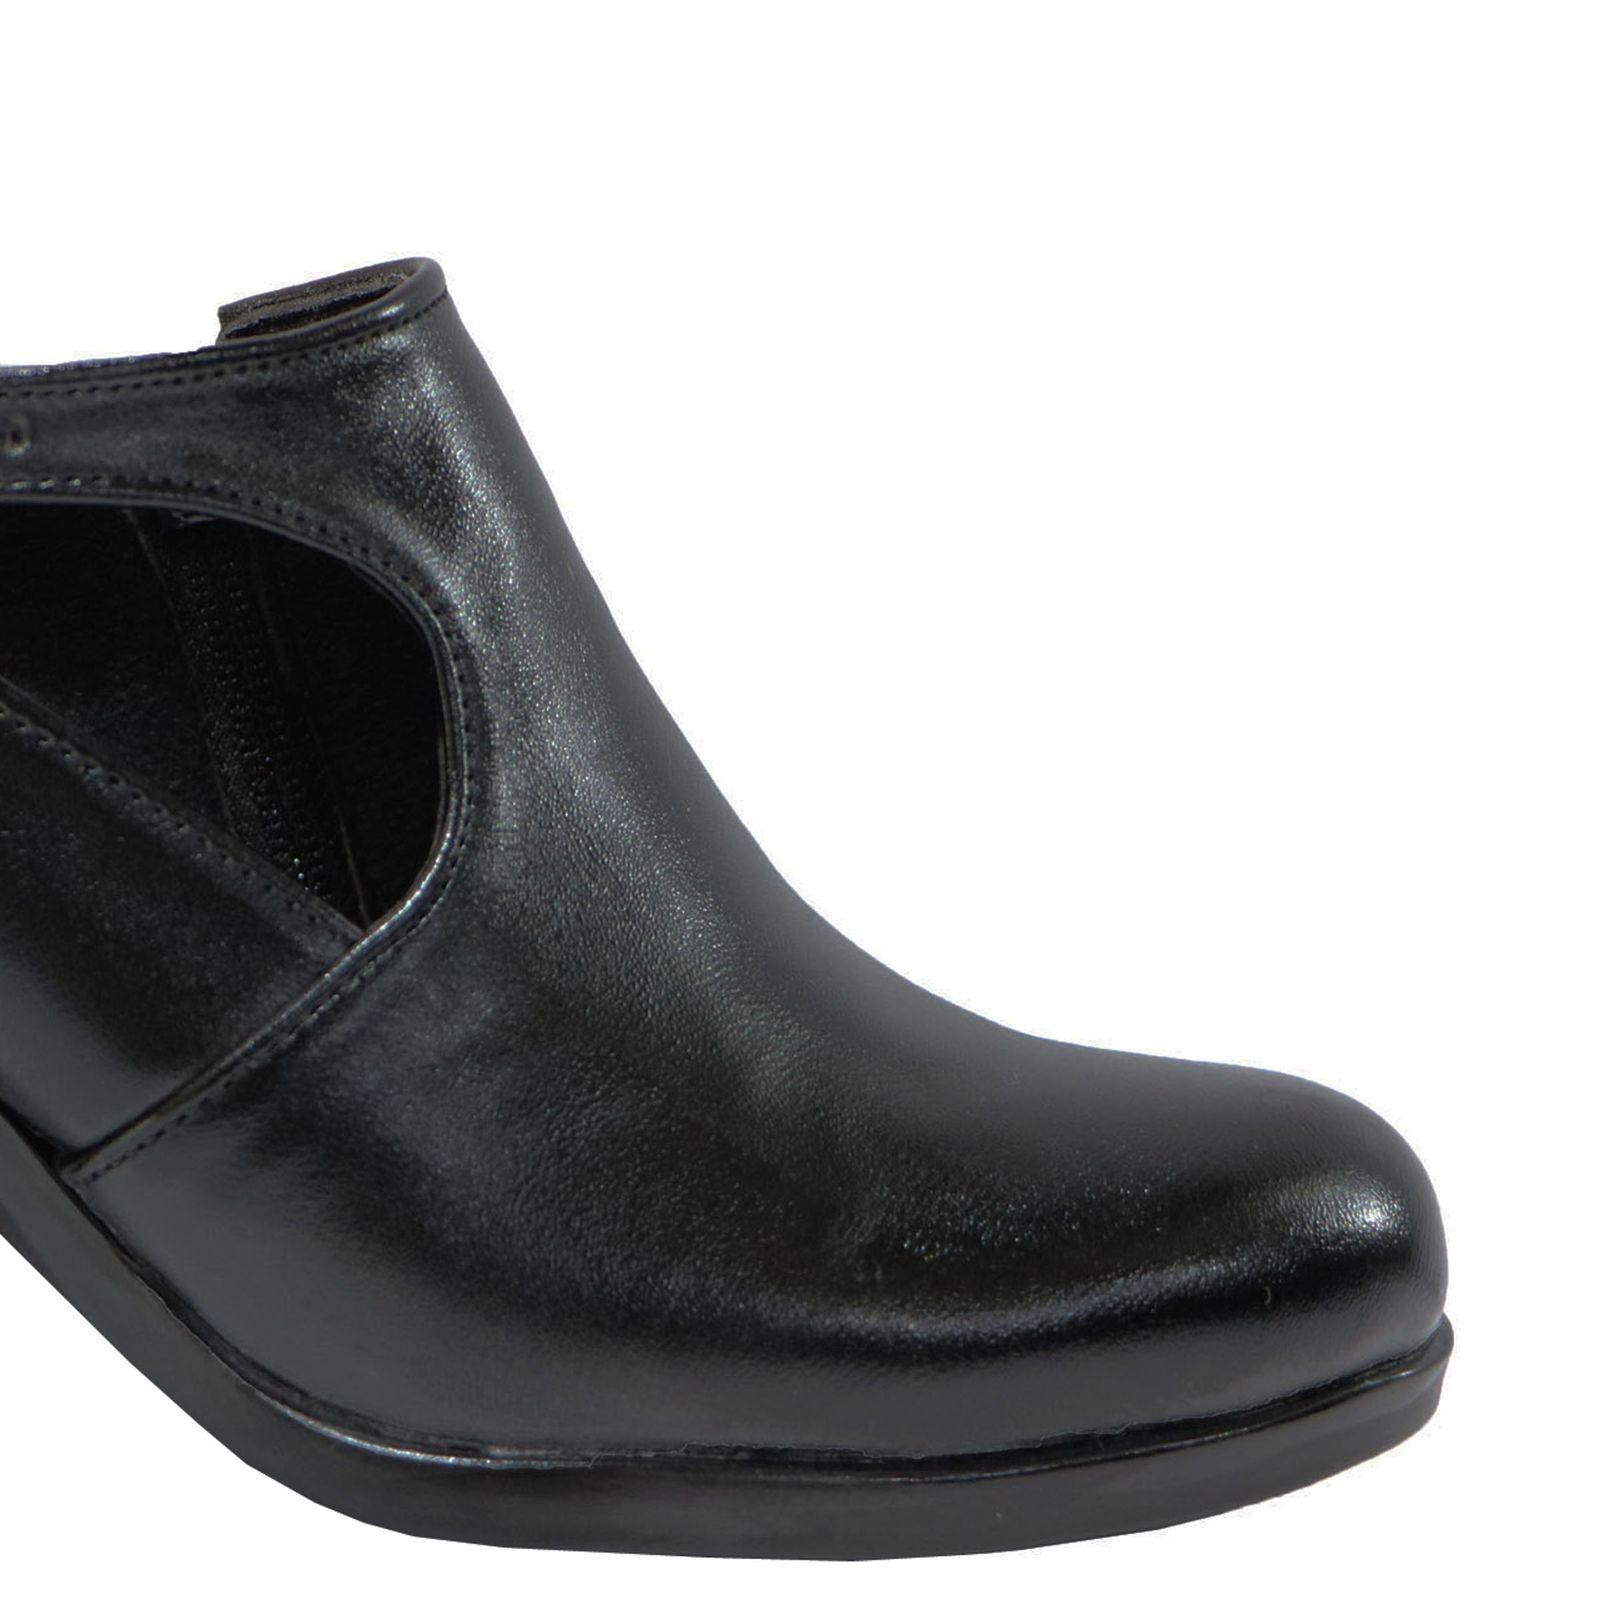 کفش زنانه کد 98223 -  - 5